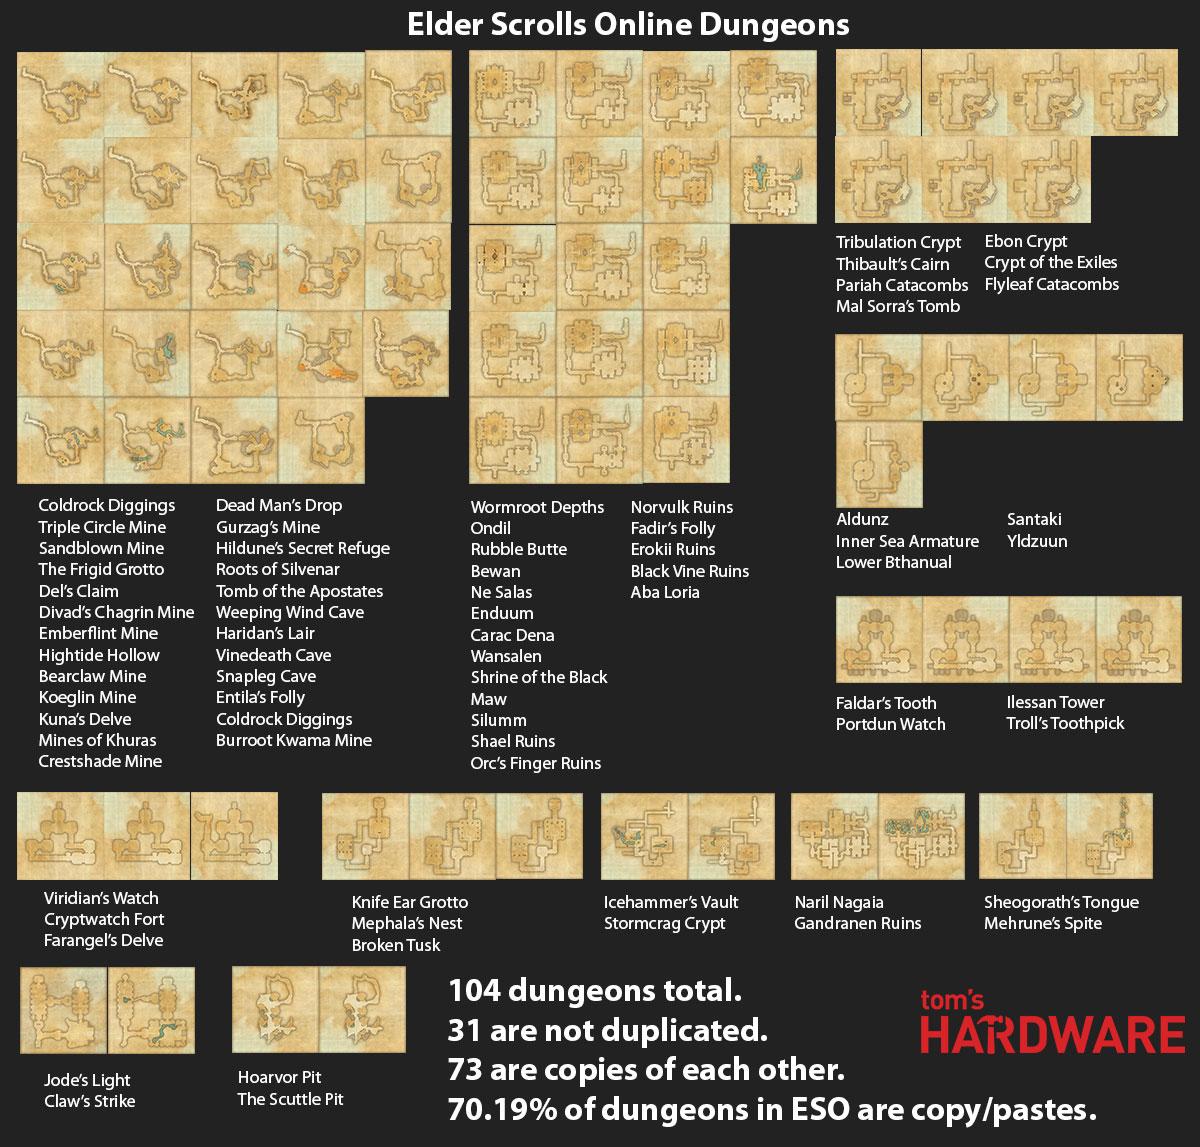 Caves, ruins, dungeons  All a big joke  — Elder Scrolls Online